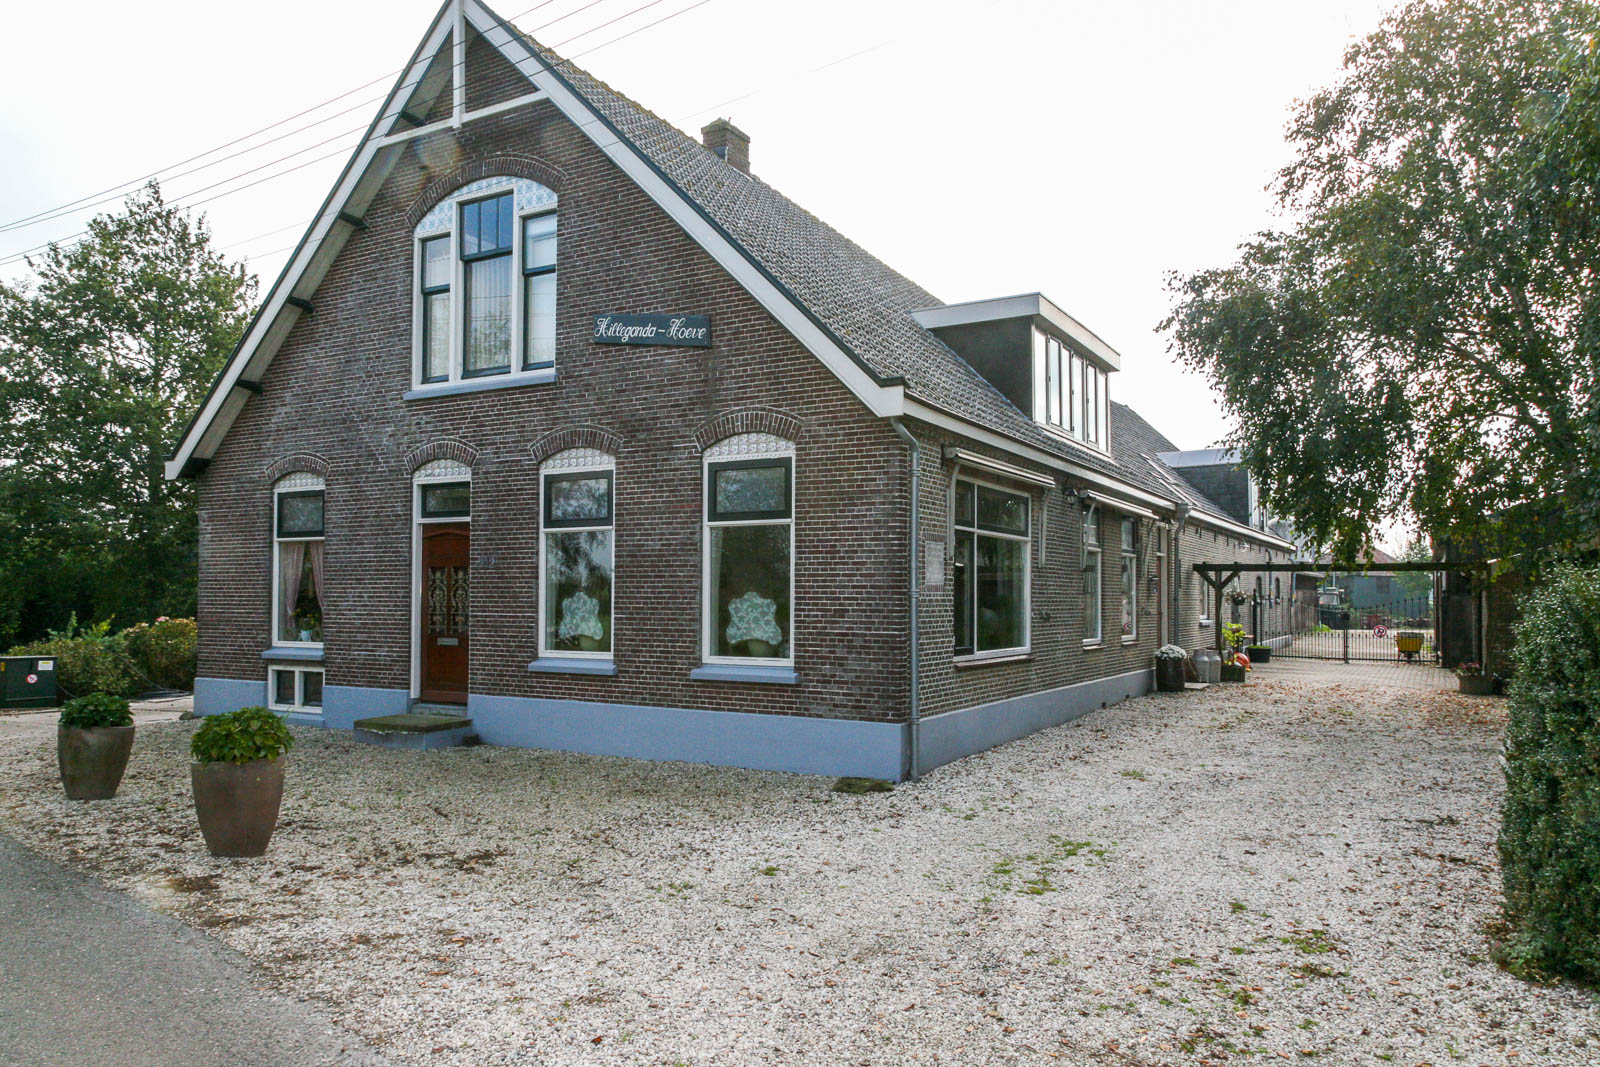 Hillegondahoeve-De Oude Stal-1480